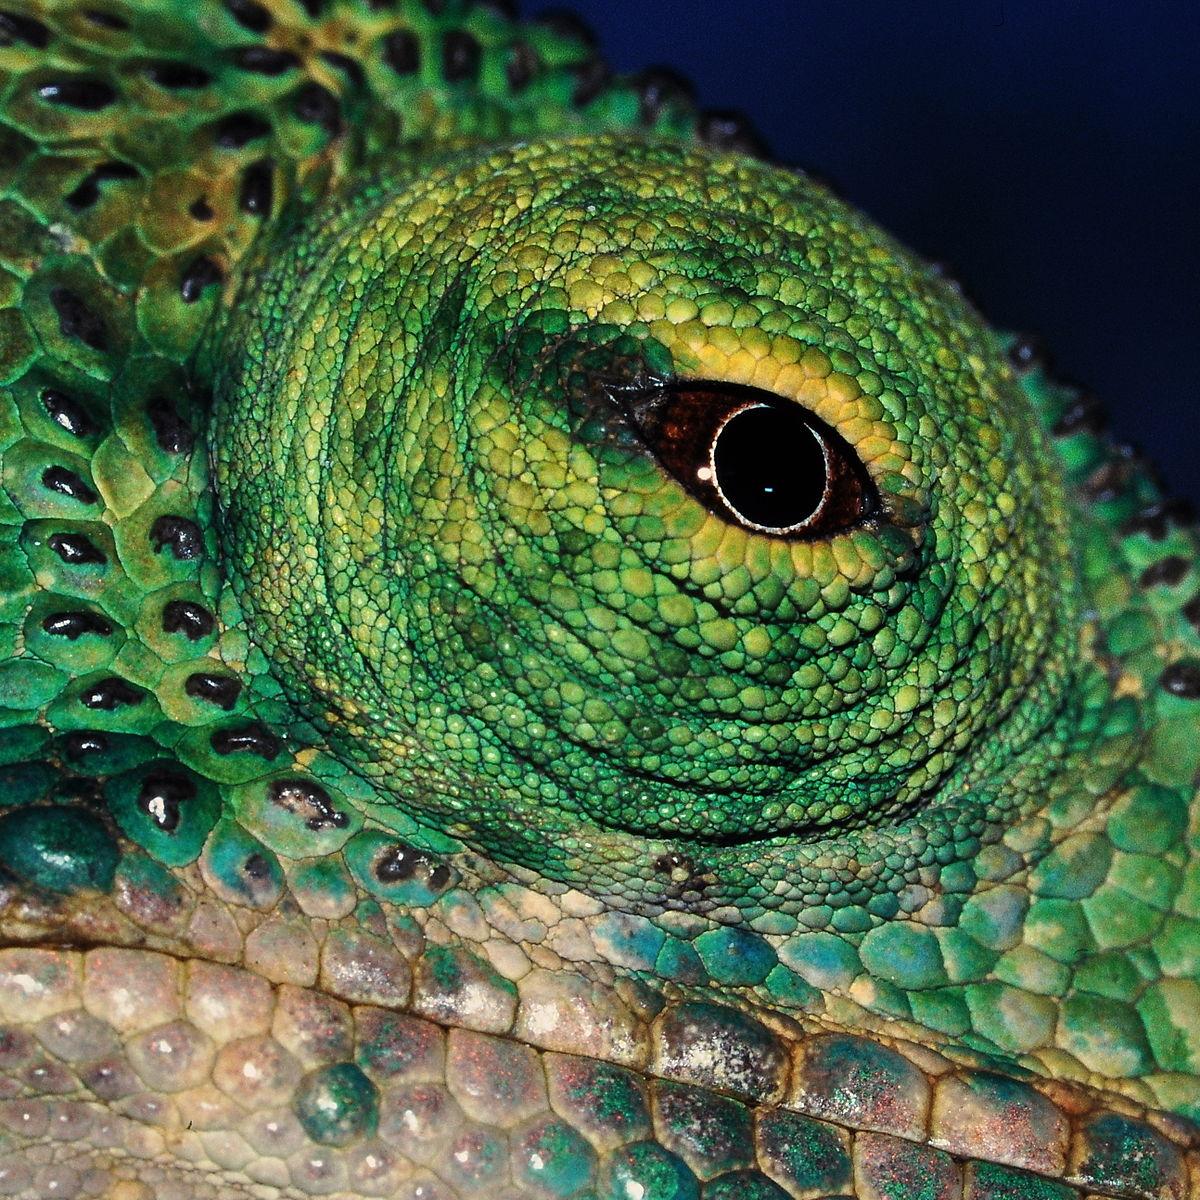 Drawn cameleon eye Chameleon  Wikipedia vision